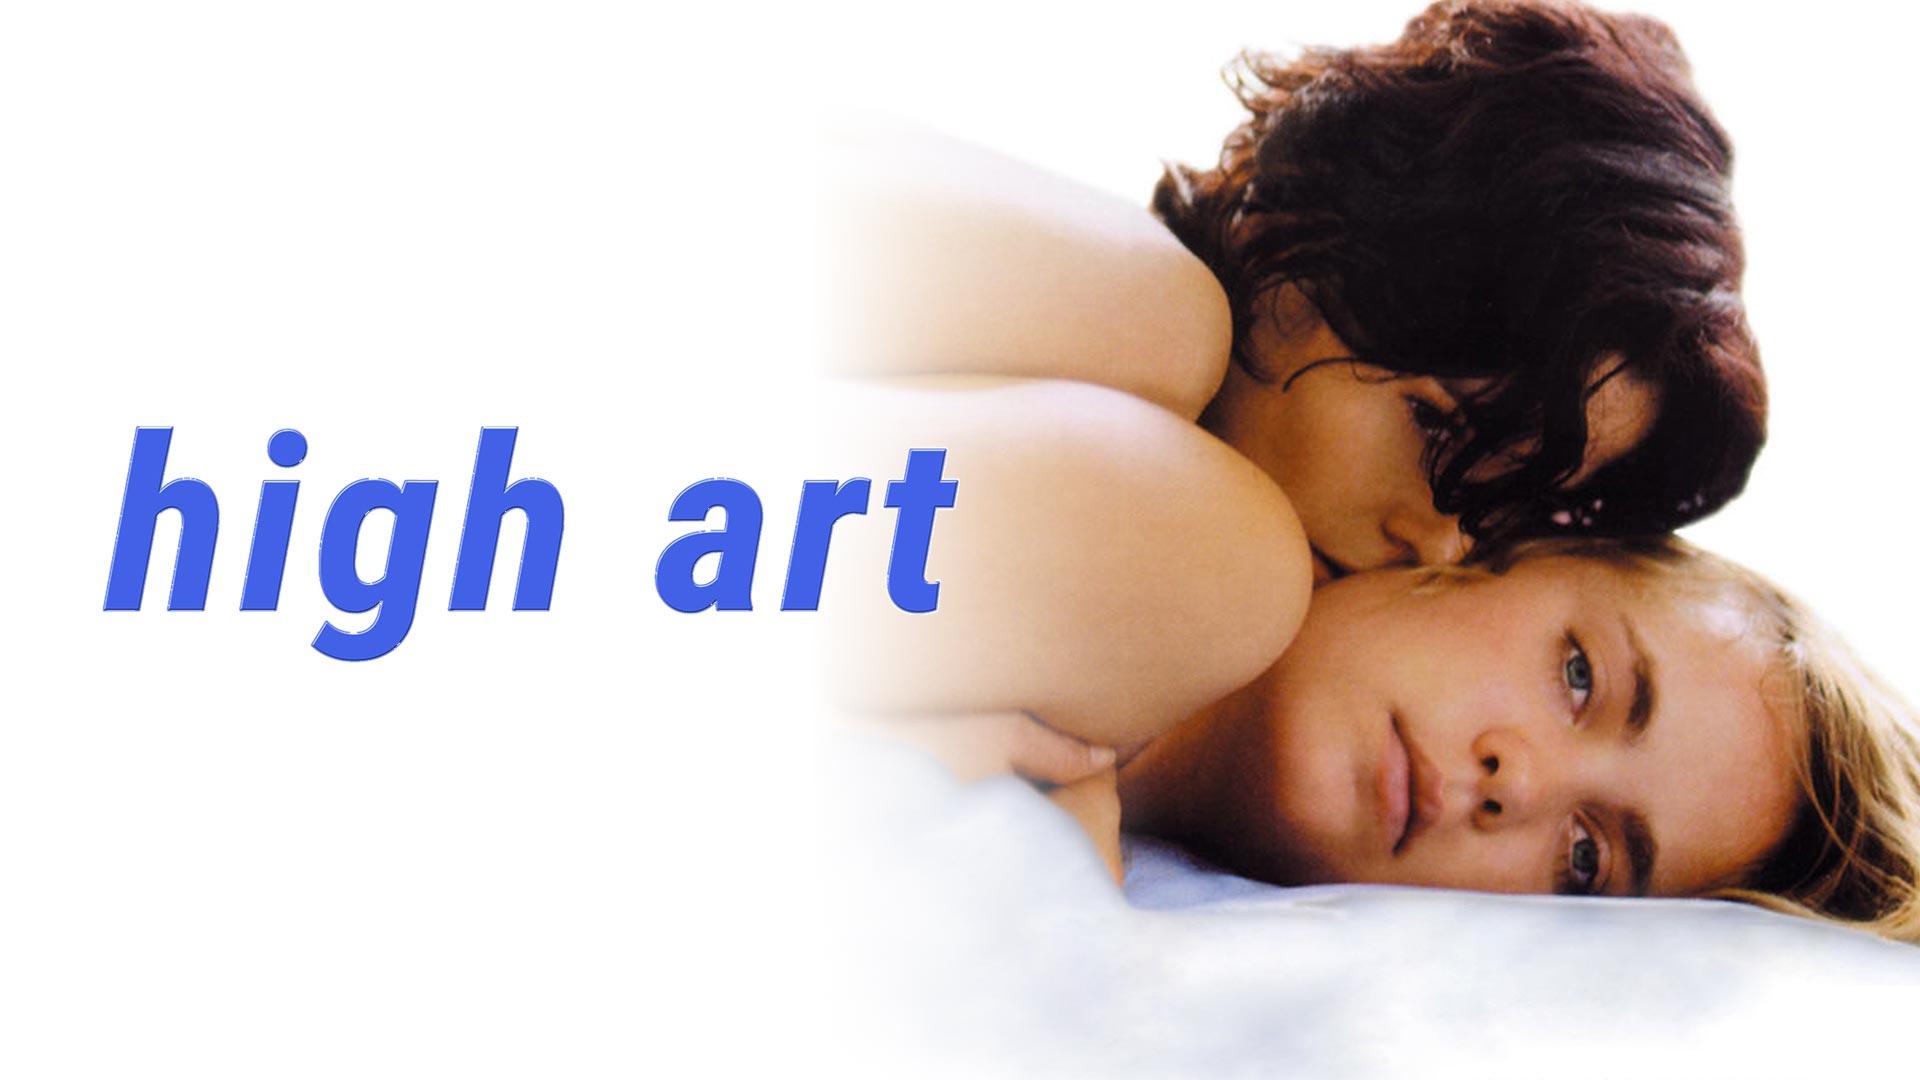 louise porno sarah junge sterne